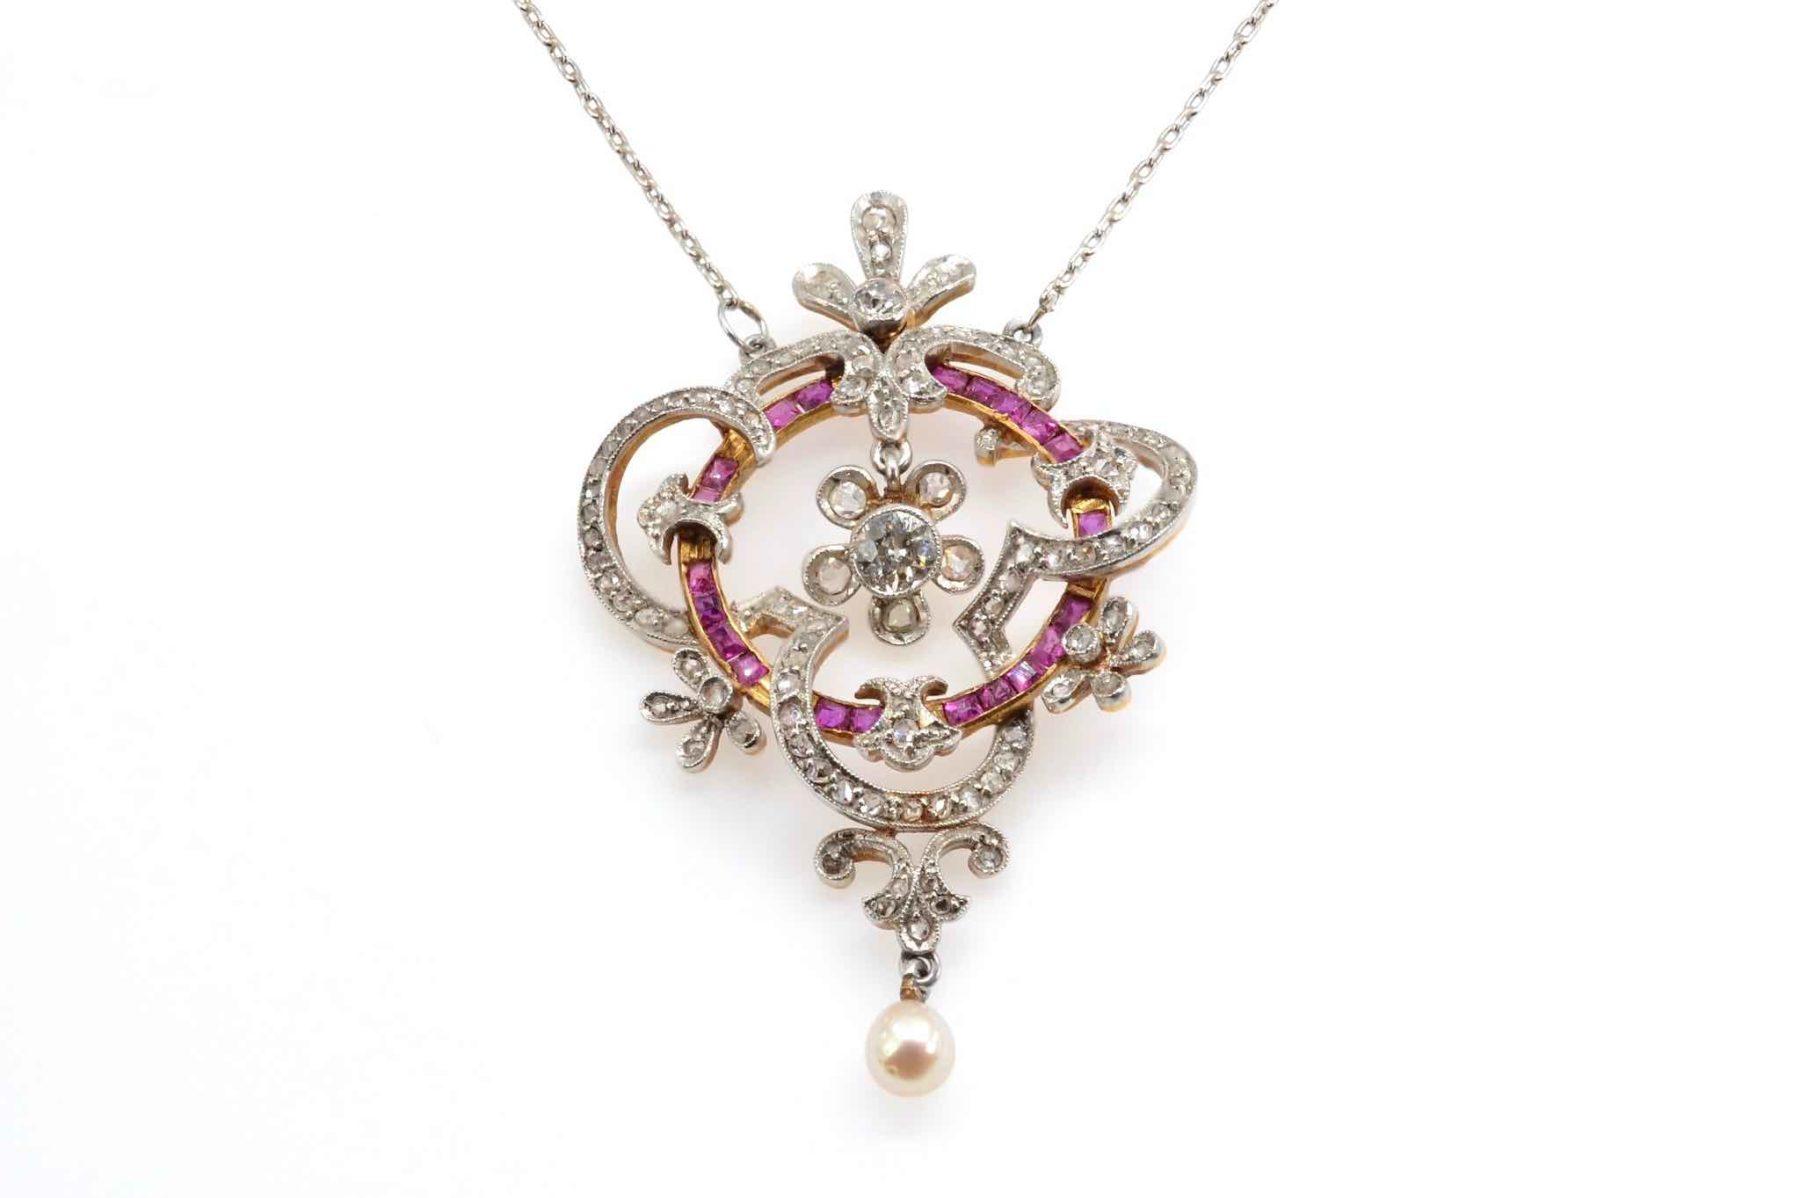 pendentif 19e siècle diamants rubis